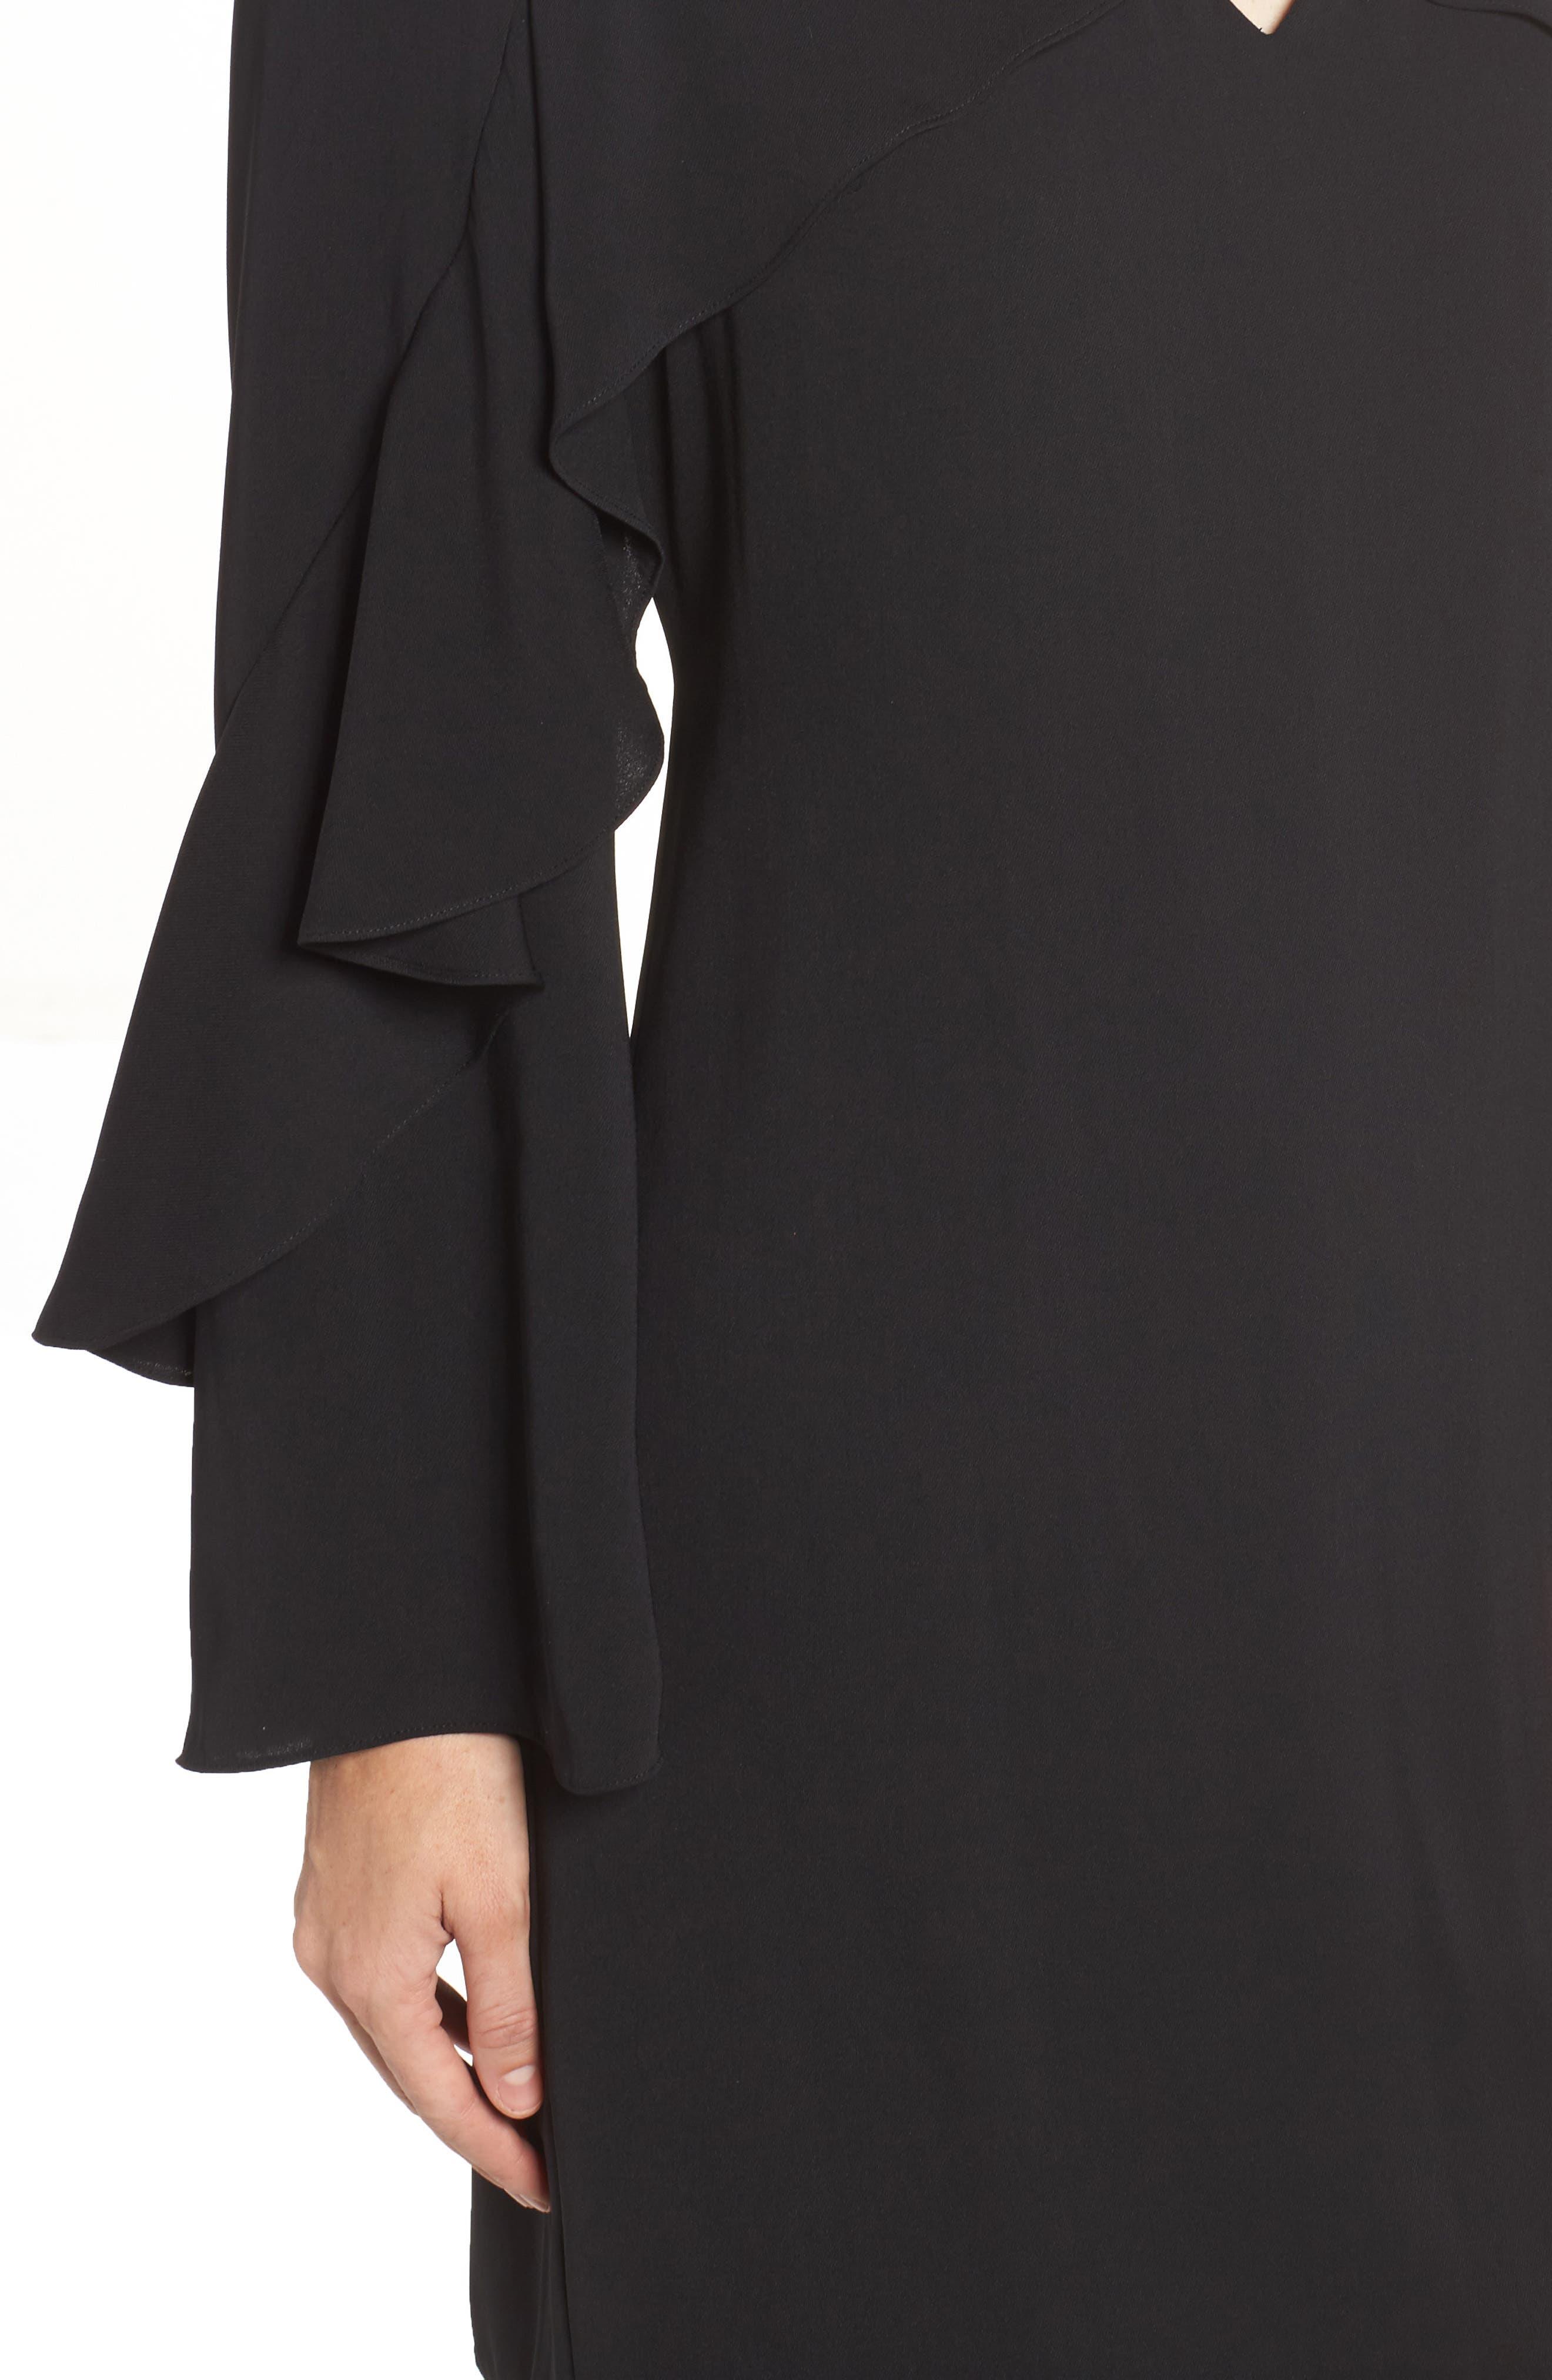 Sherryl Ruffle Sleeve Shift Dress,                             Alternate thumbnail 4, color,                             Black